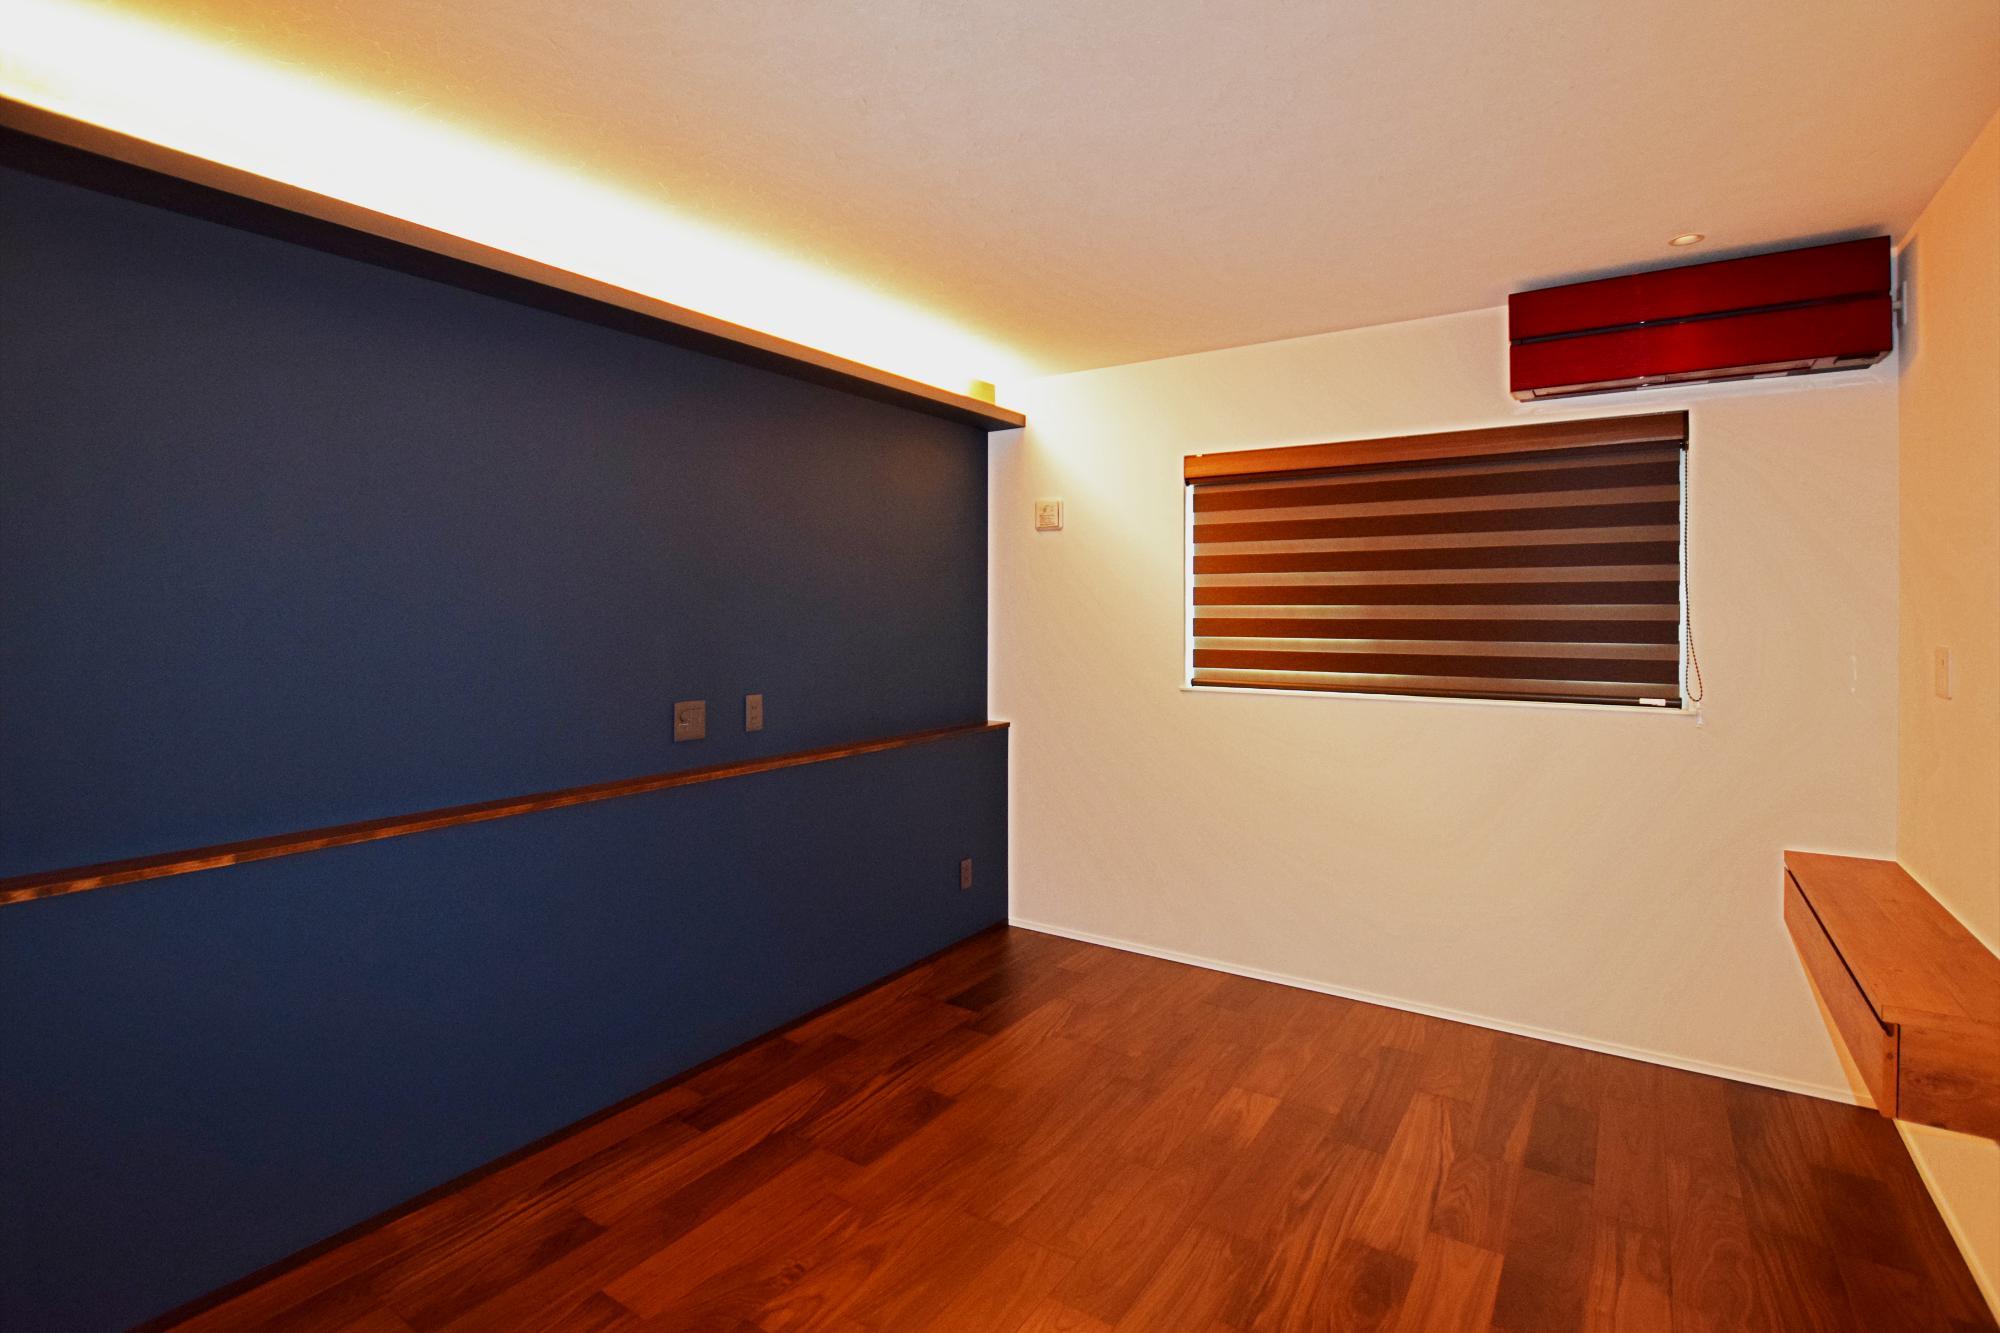 DETAIL HOME(ディテールホーム)「光と風、ローケションを楽しみ、時を過ごせる平屋」のシンプル・ナチュラル・モダンな居室の実例写真